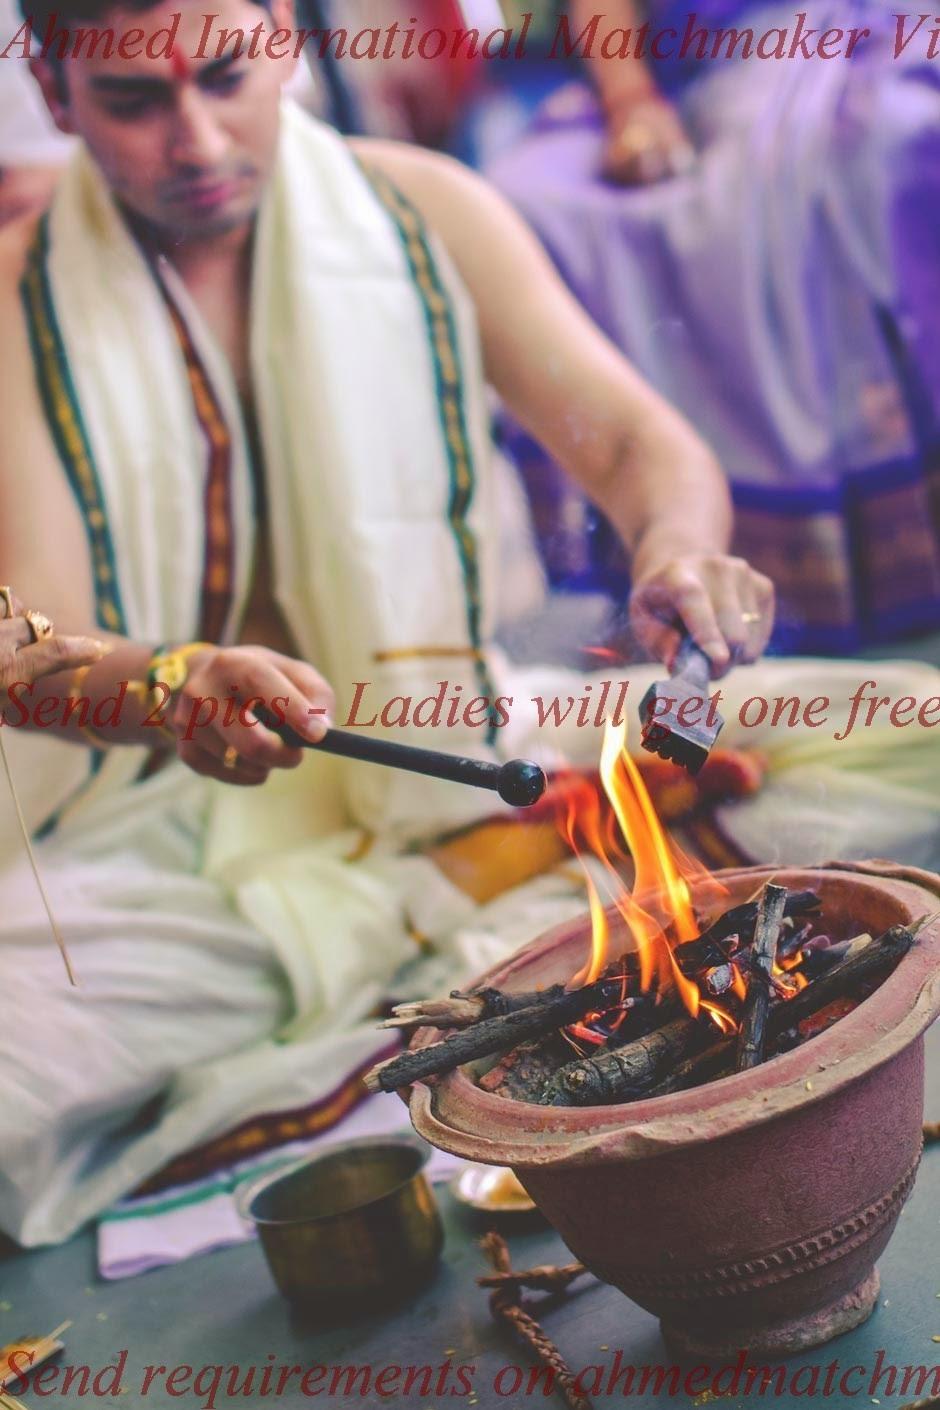 Muslim matchmaking canada-in-Ragiteiki